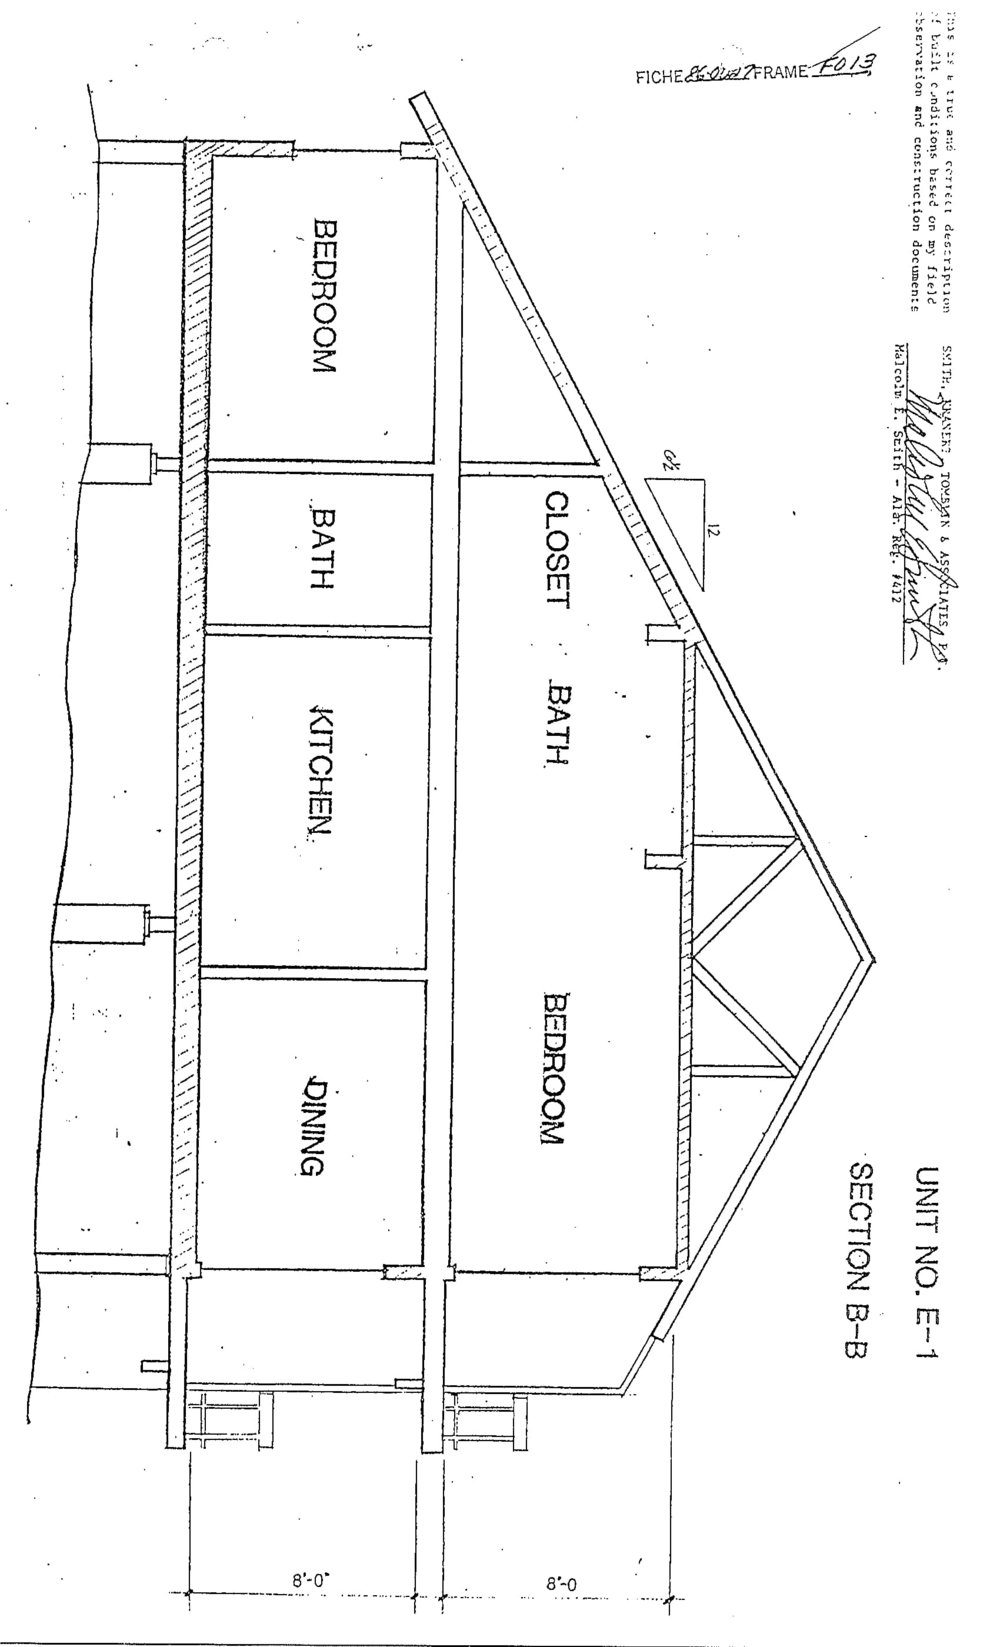 Covenants-Rivers-Edge-Condominiums-All-Phases-149.jpg